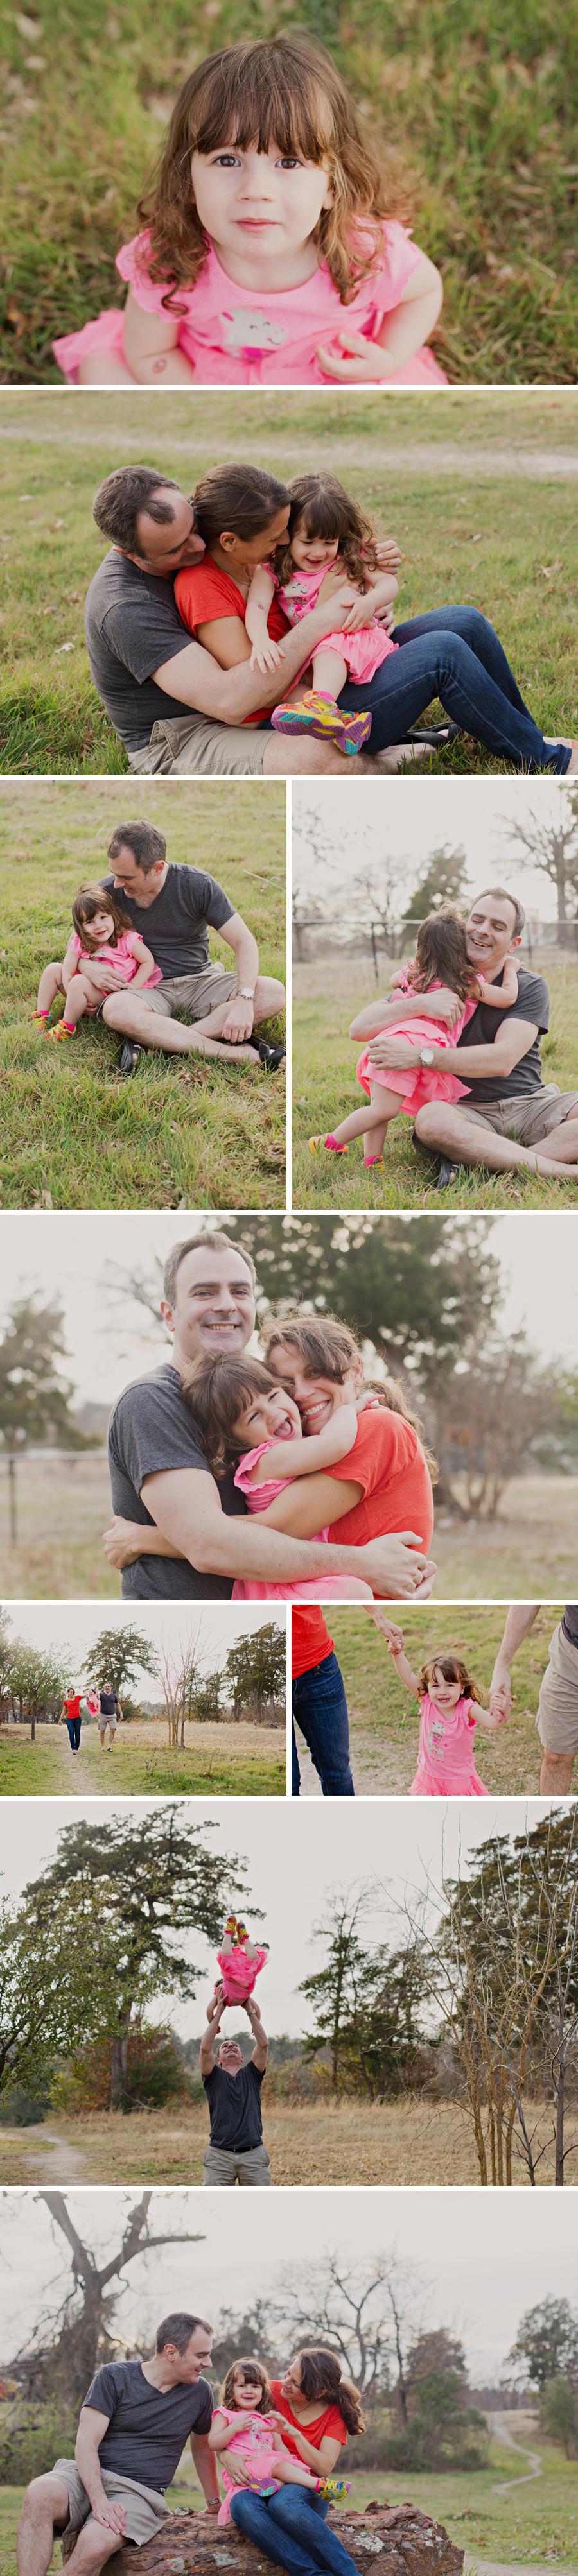 Dallas-Family-Photographerc016